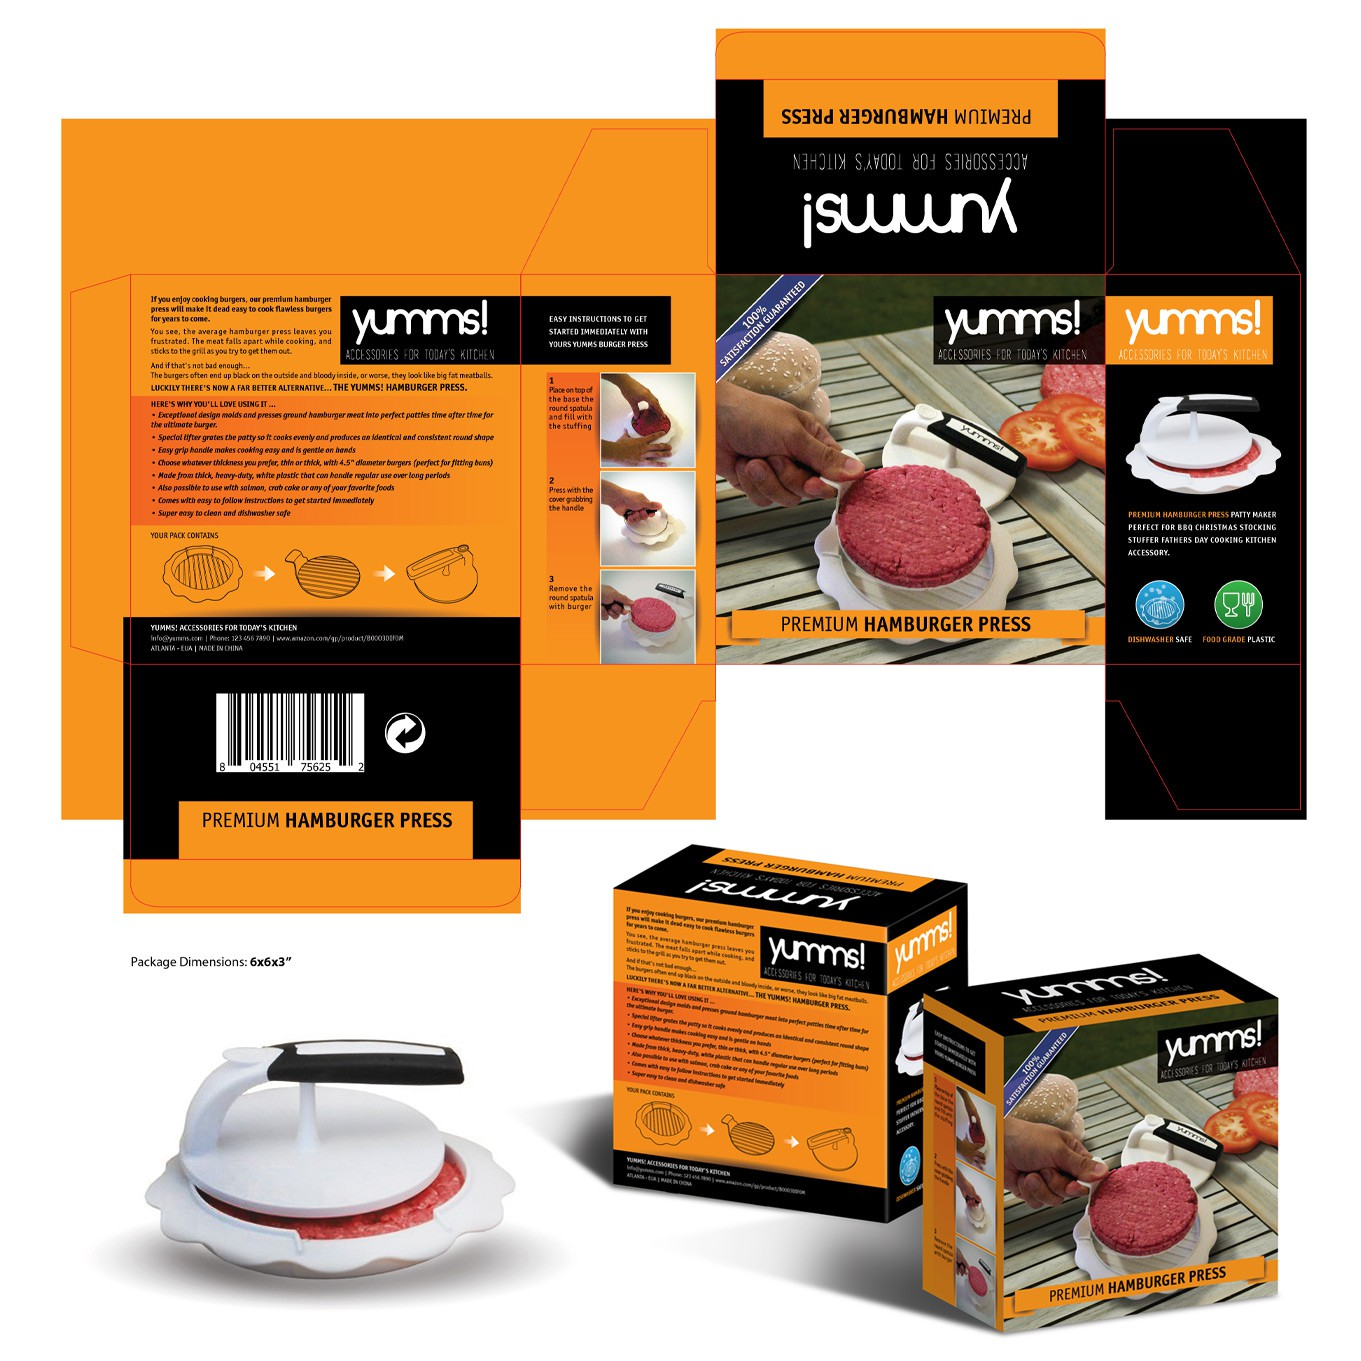 create a stunning package for Yumms! Hamburger Press